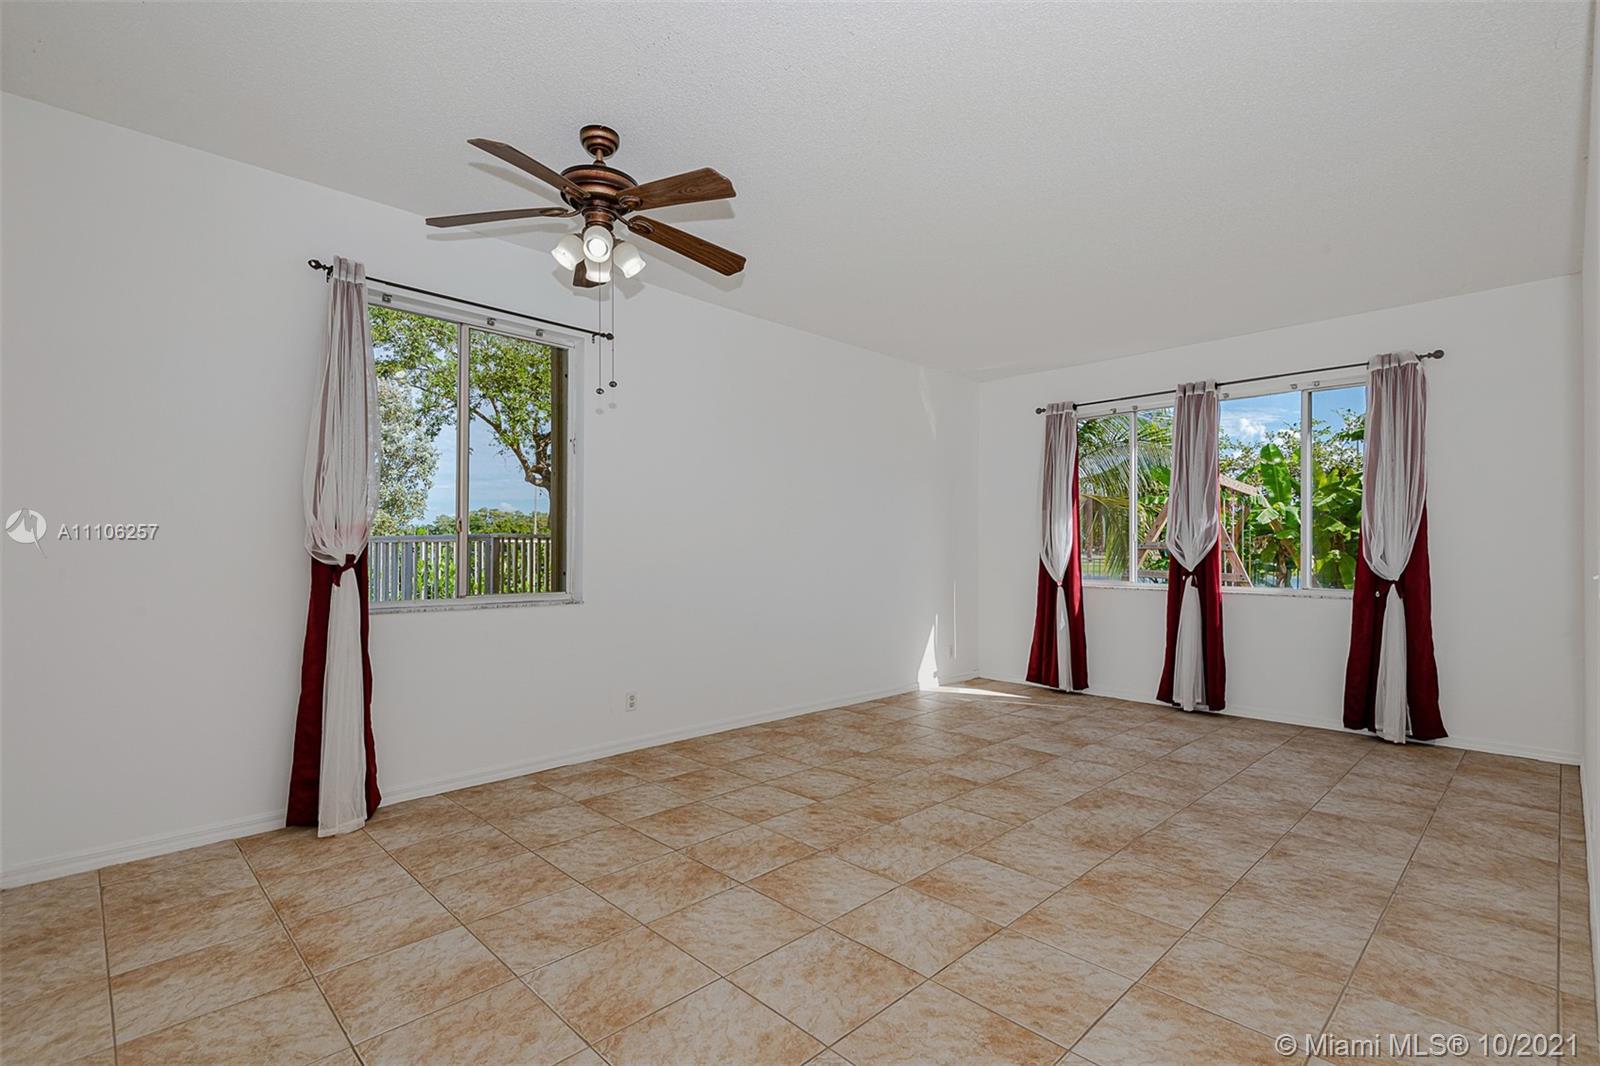 4684 Waycross Dr, Coconut Creek, Florida 33073